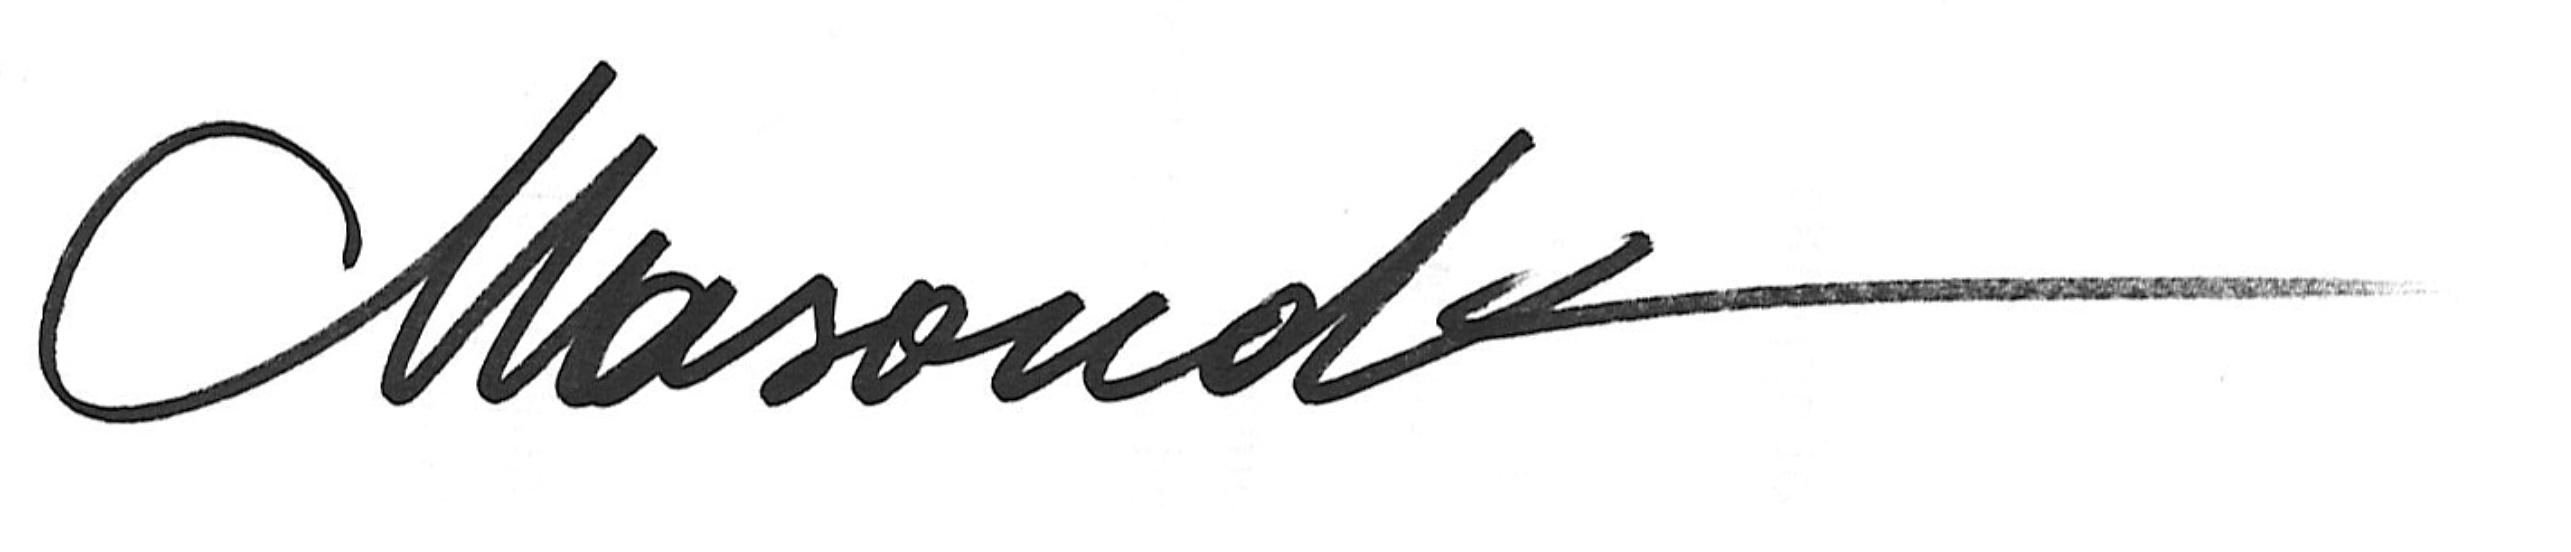 Masoud Kamali Signature